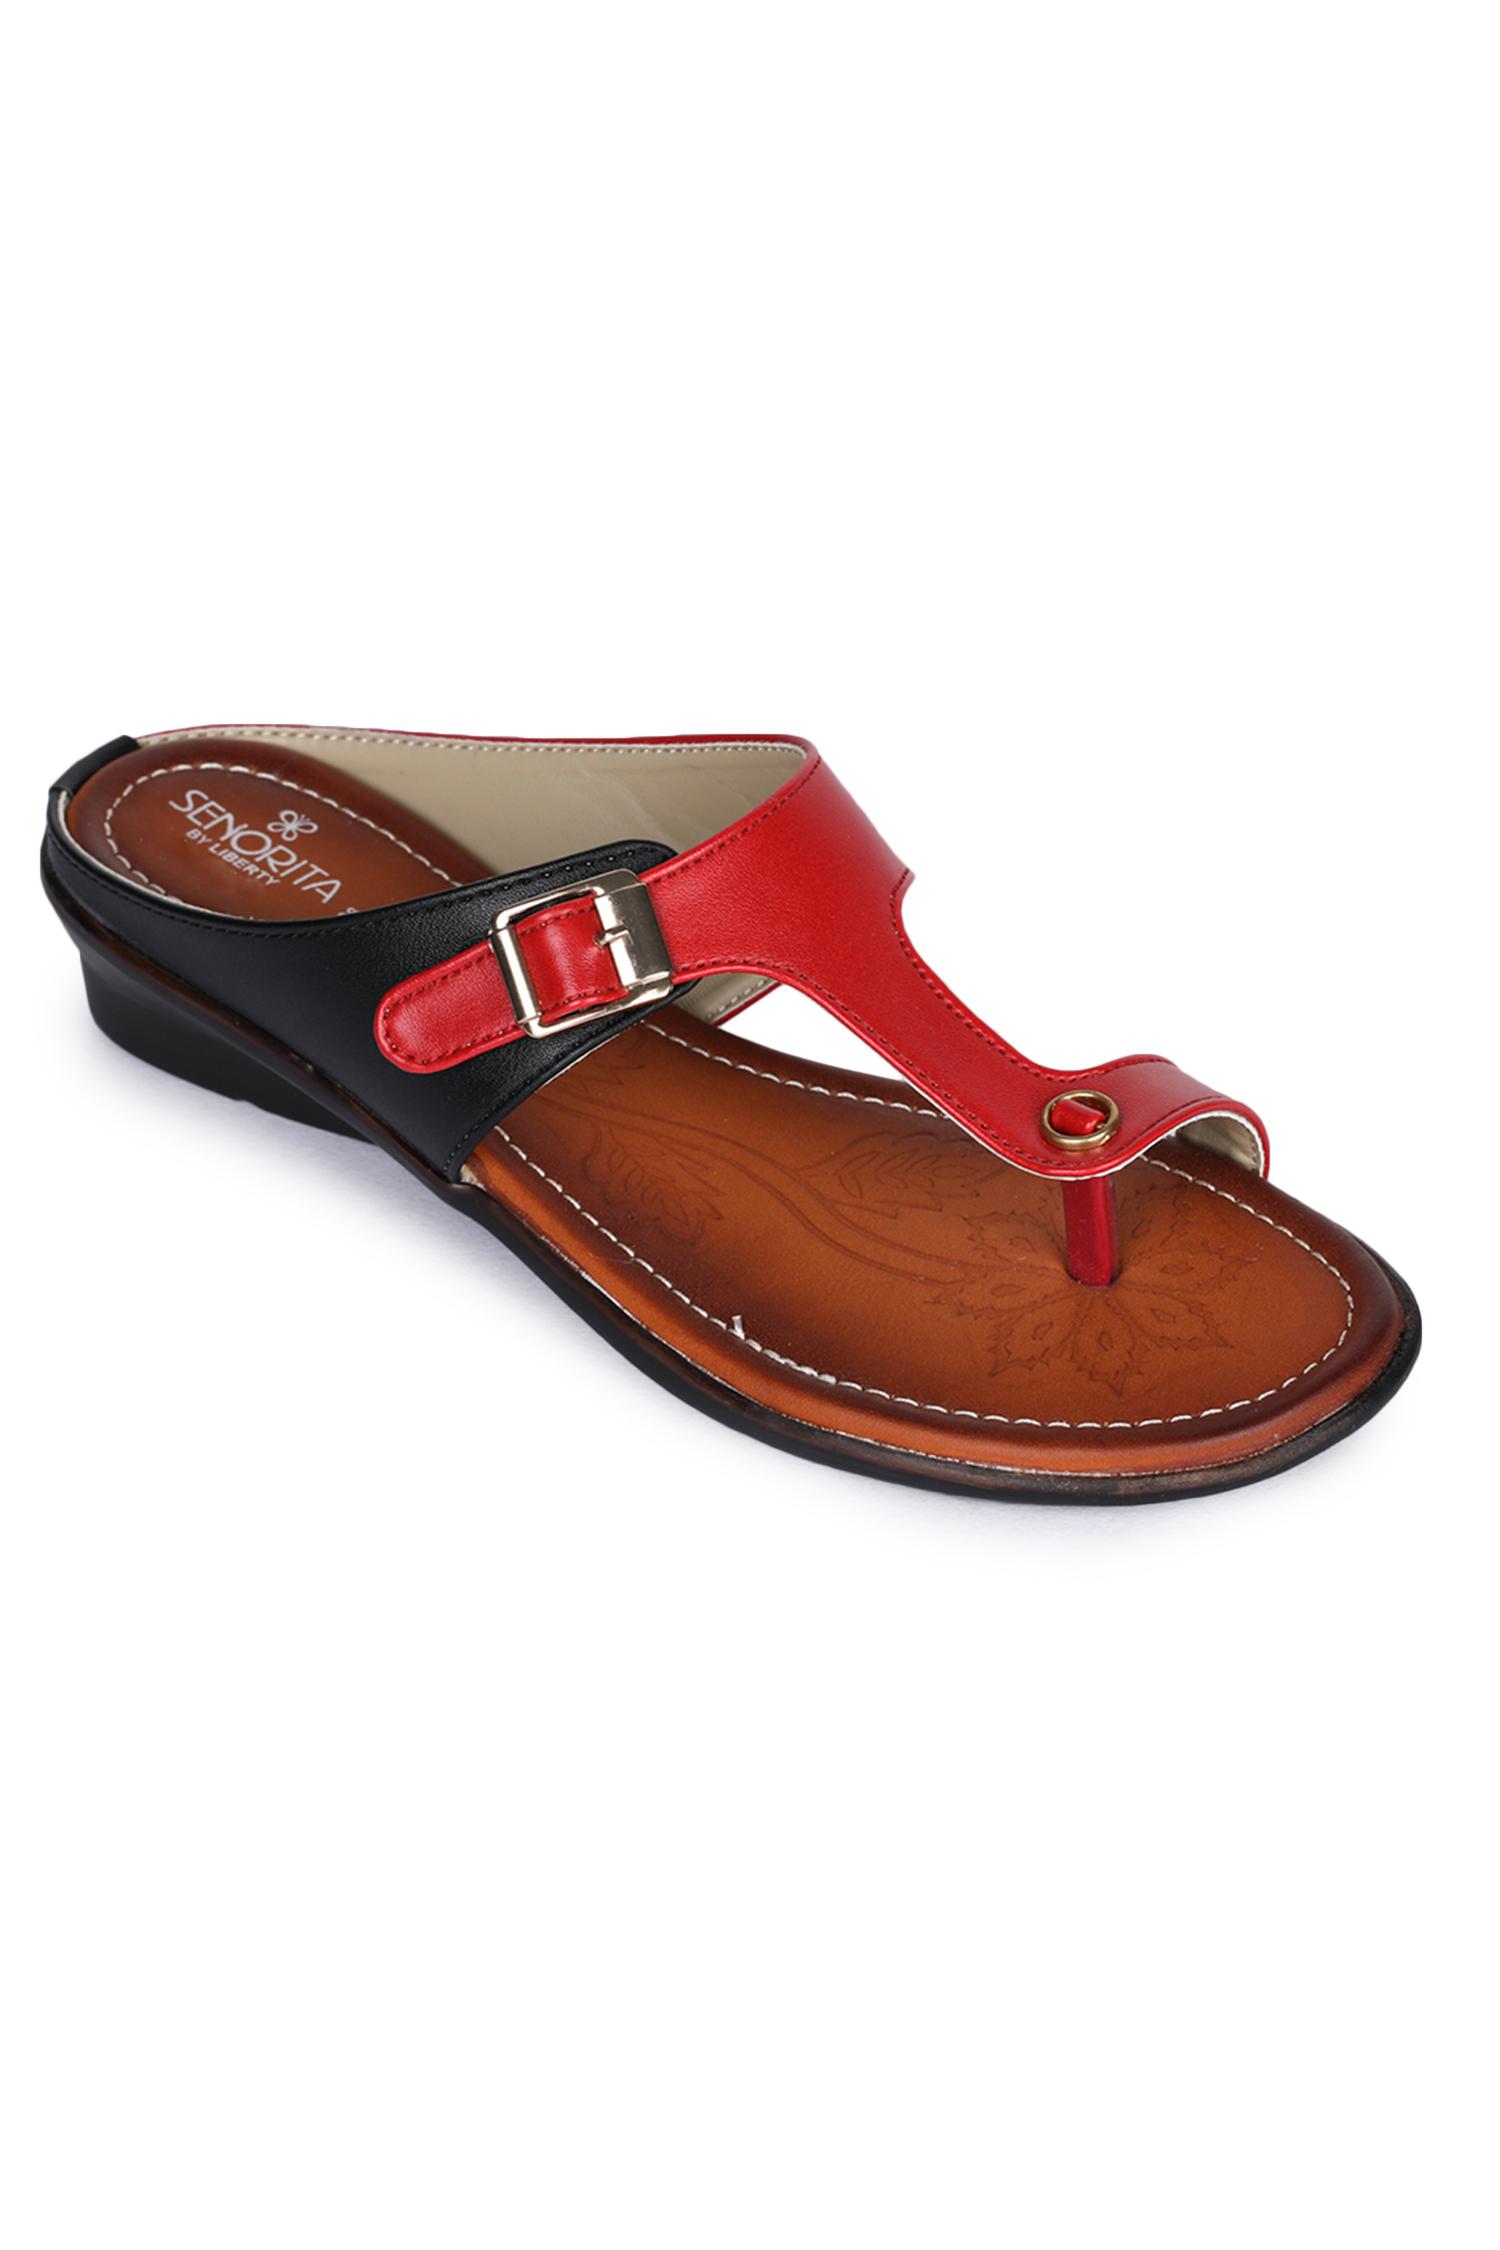 Liberty | Liberty SENORITA Sandals D1-06_RED For - Women